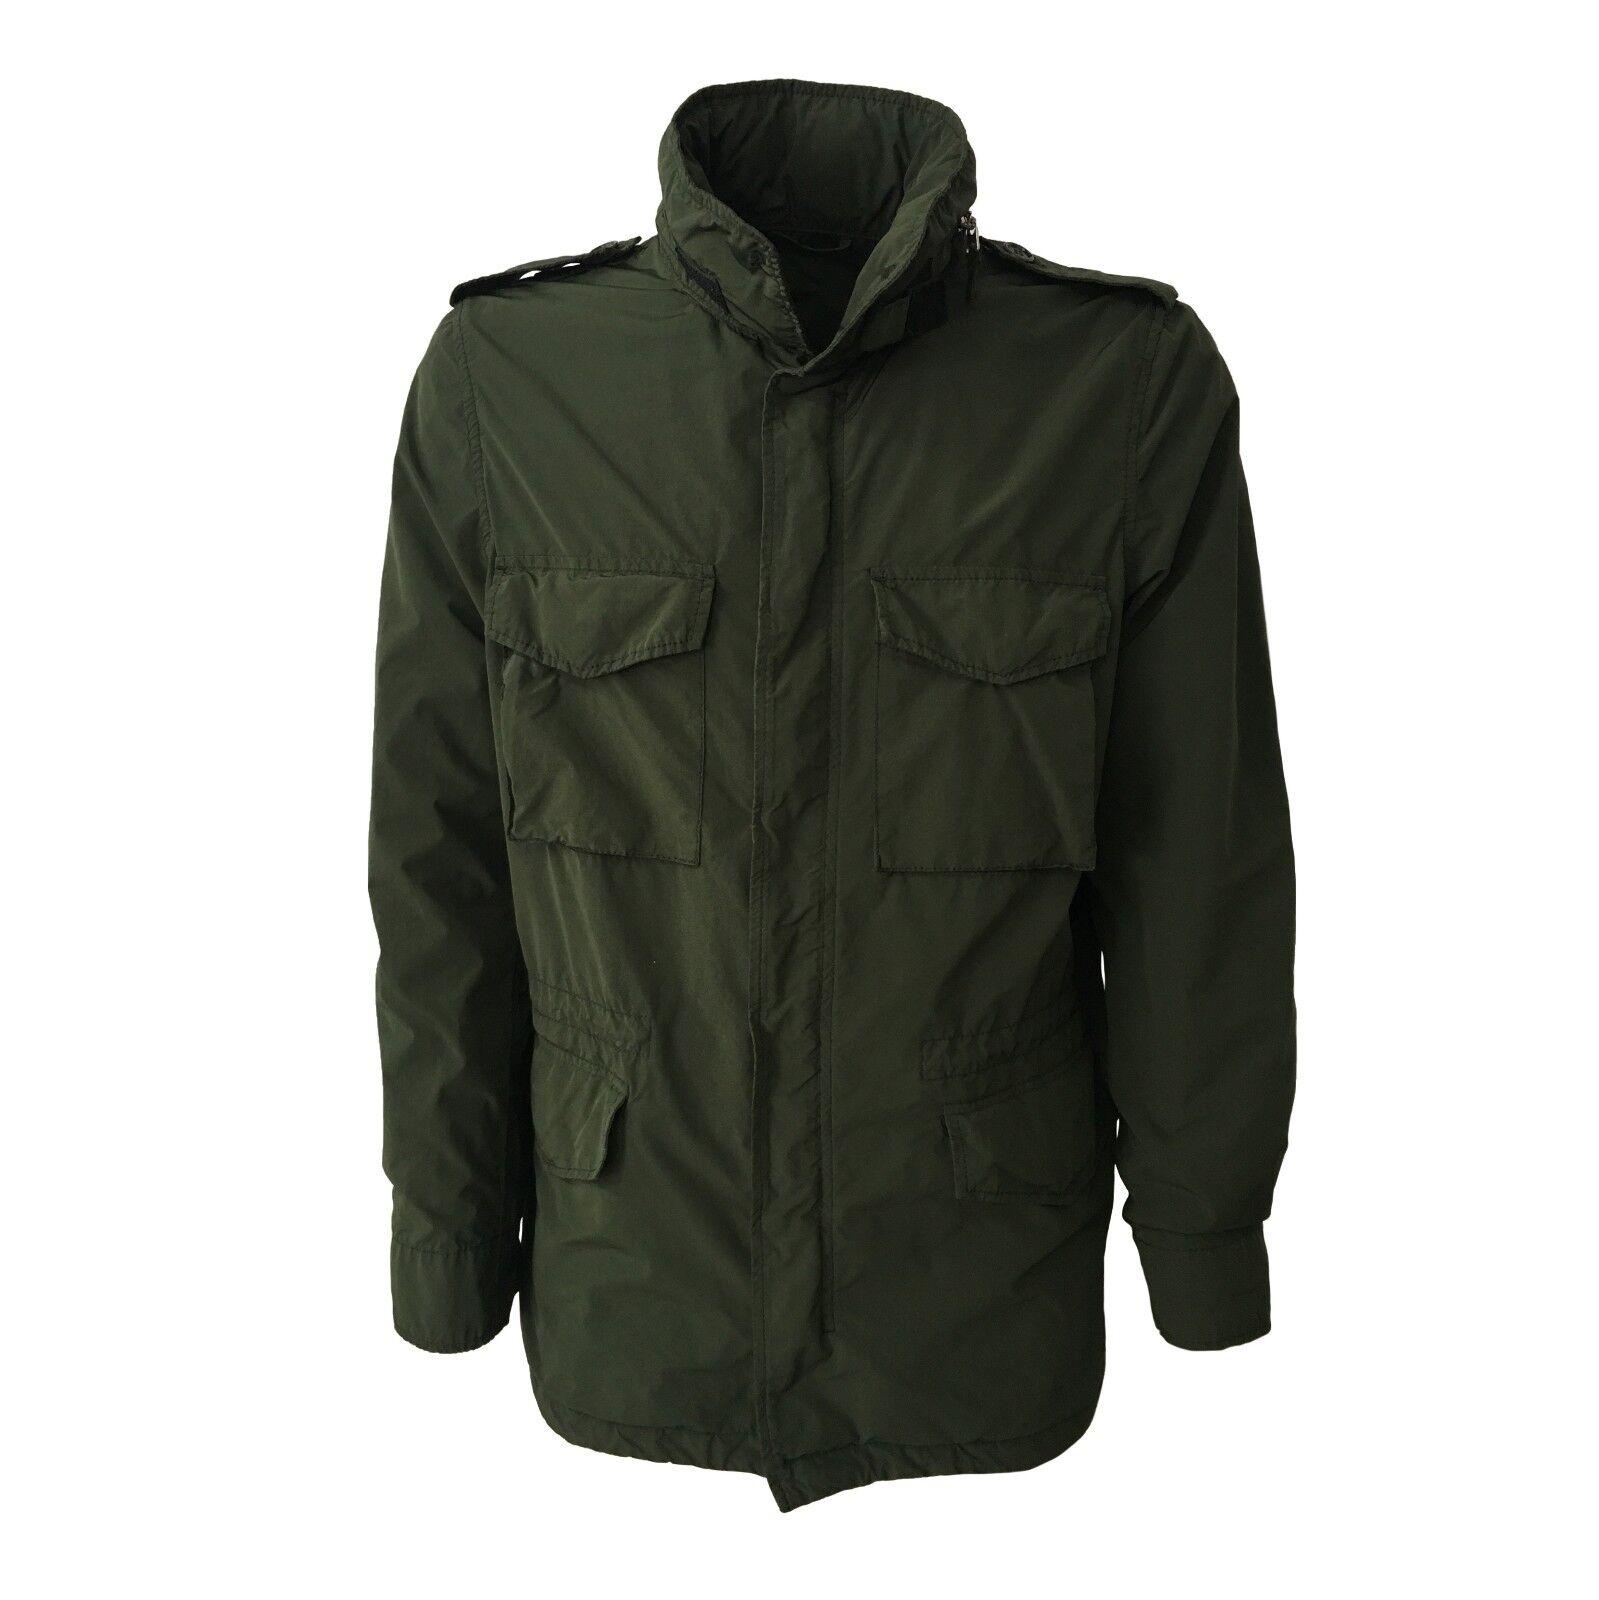 2ccda2a74b Dettagli su ASPESI giacca uomo verde mod I I721F973 65 REPLICA 80%  poliestere 20% poliammide